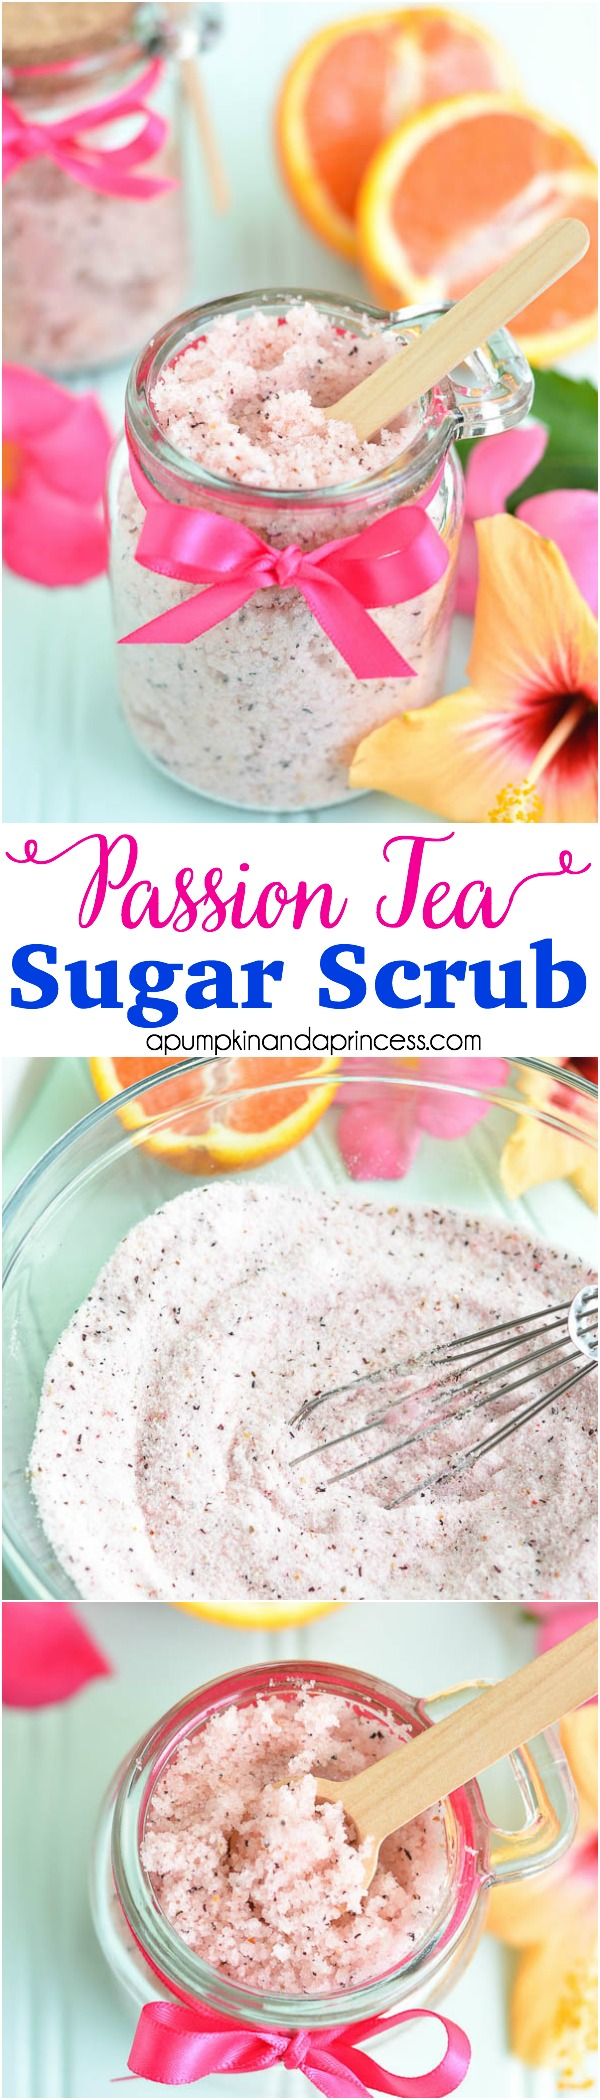 DIY Passion Tea Sugar Scrub